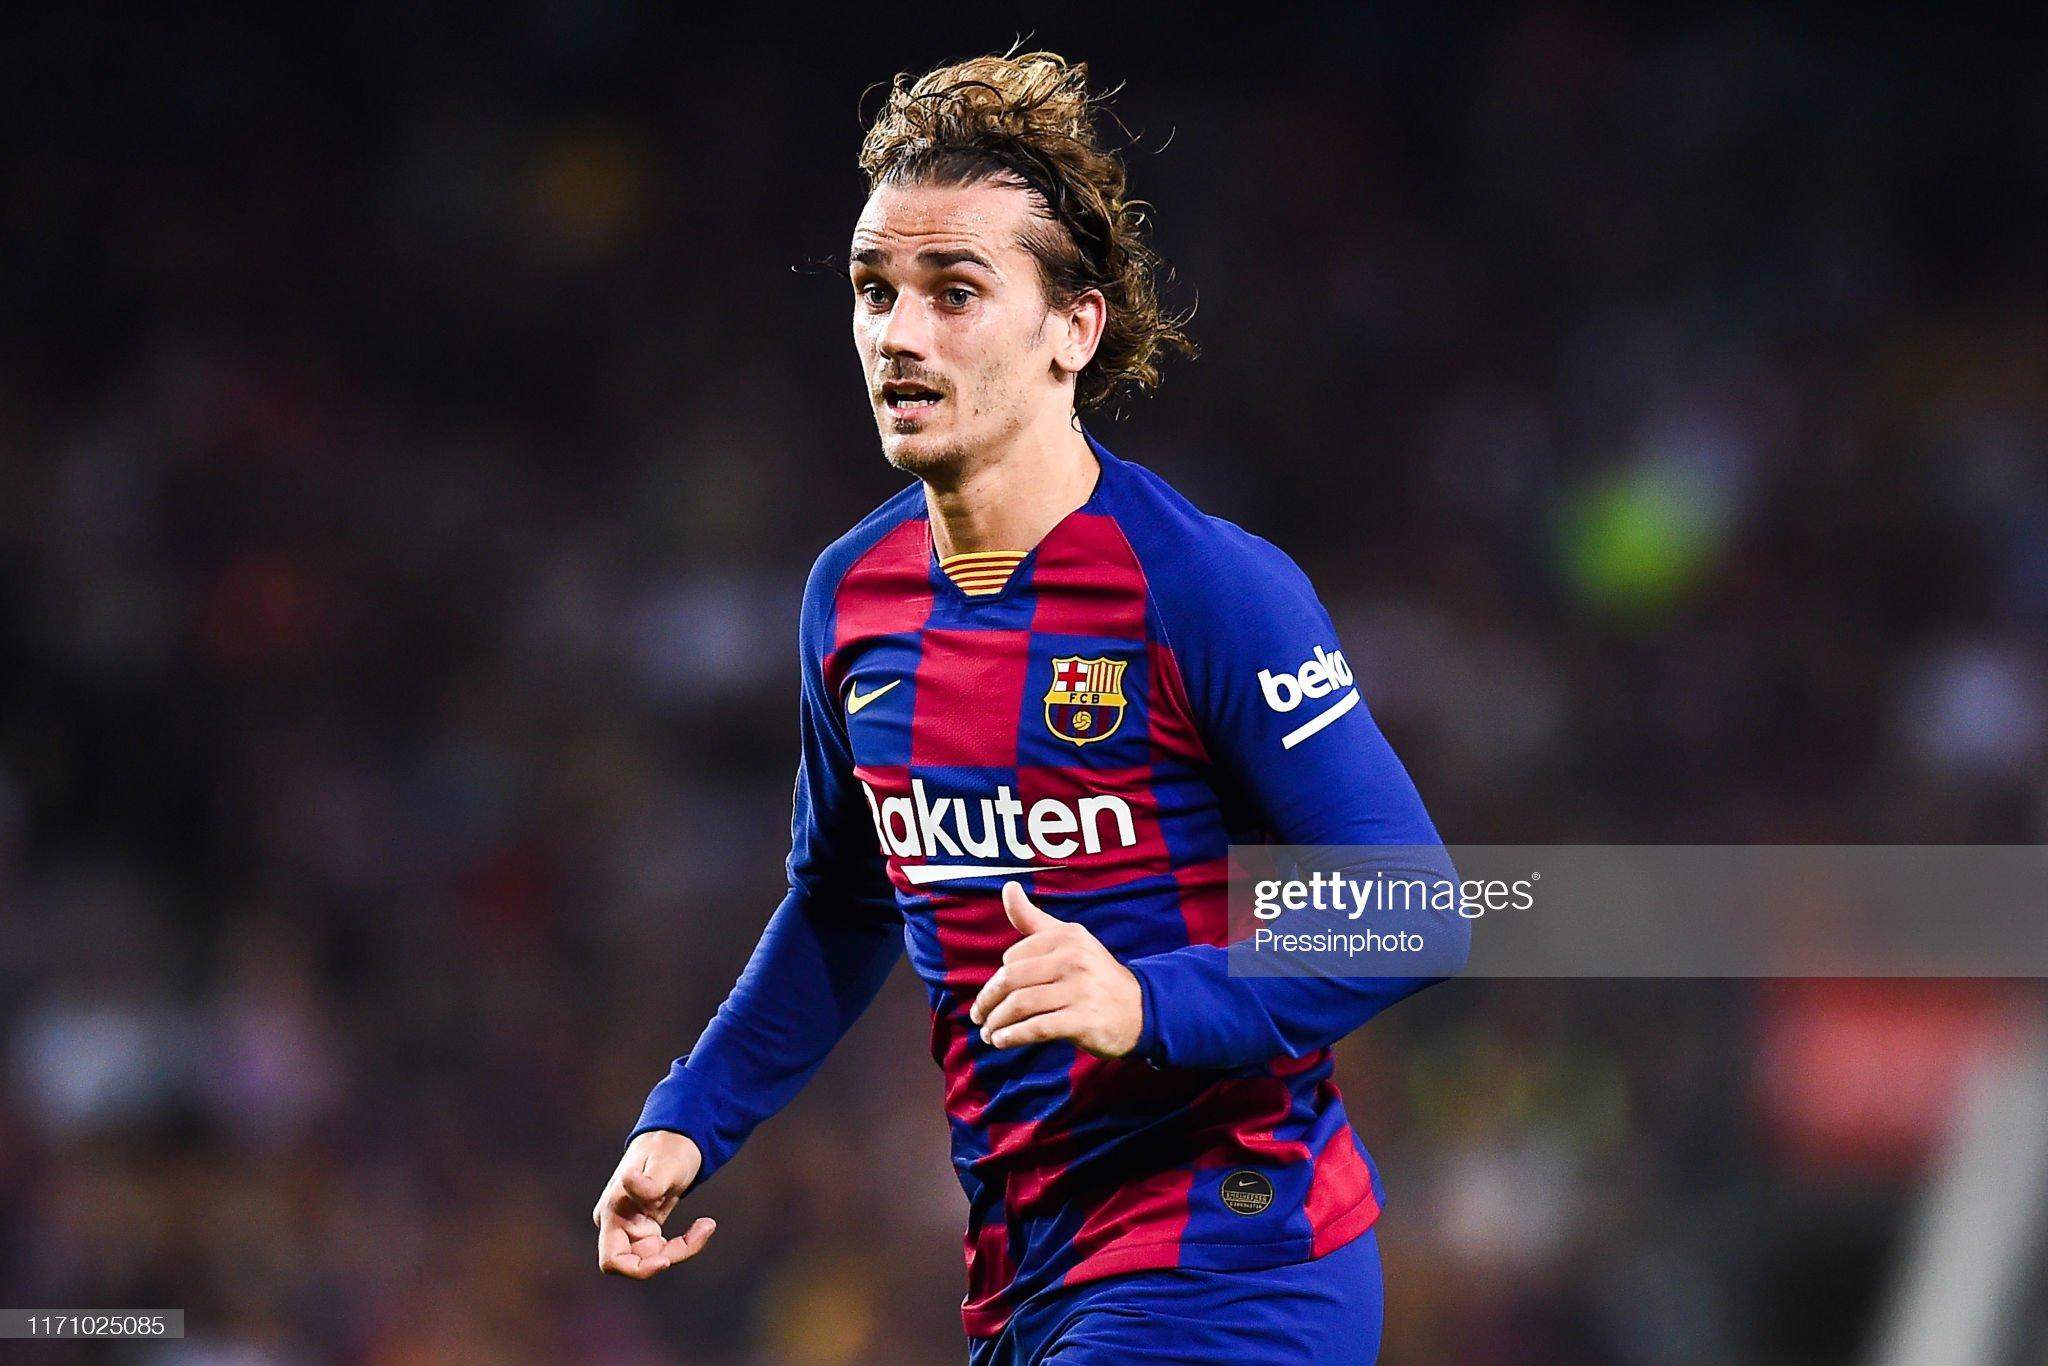 صور مباراة : برشلونة - فياريال 2-1 ( 24-09-2019 )  Antoine-griezmann-of-fc-barcelona-during-the-liga-match-between-and-picture-id1171025085?s=2048x2048